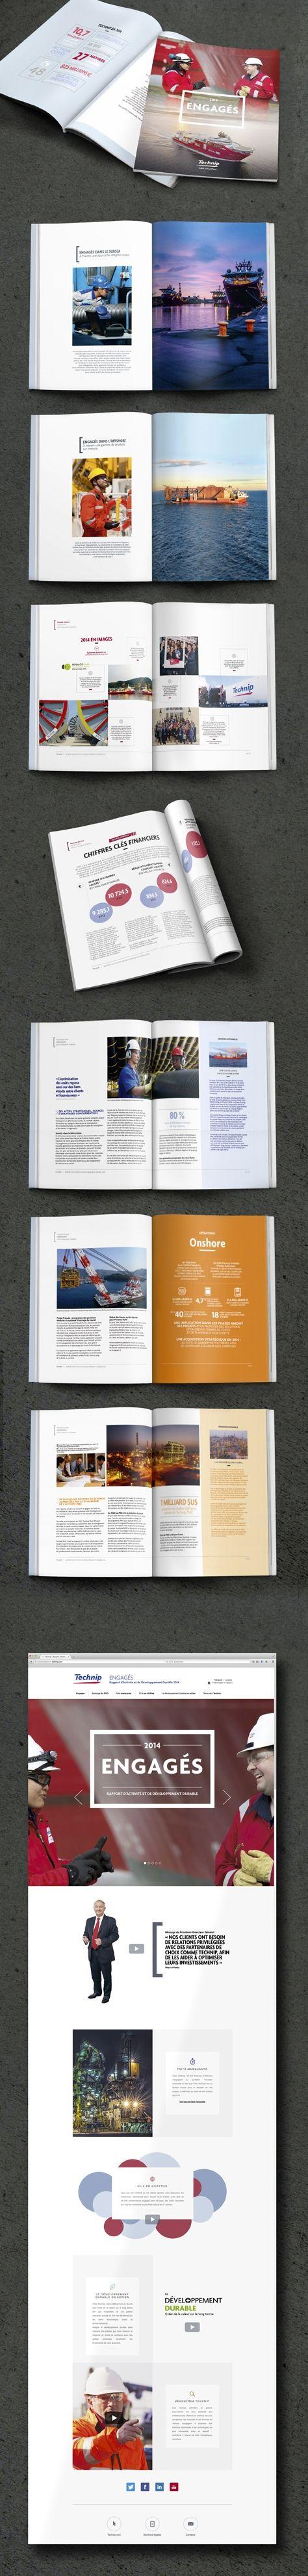 Home front tor design katalog  best ideas for print portfolio images on pinterest  page layout